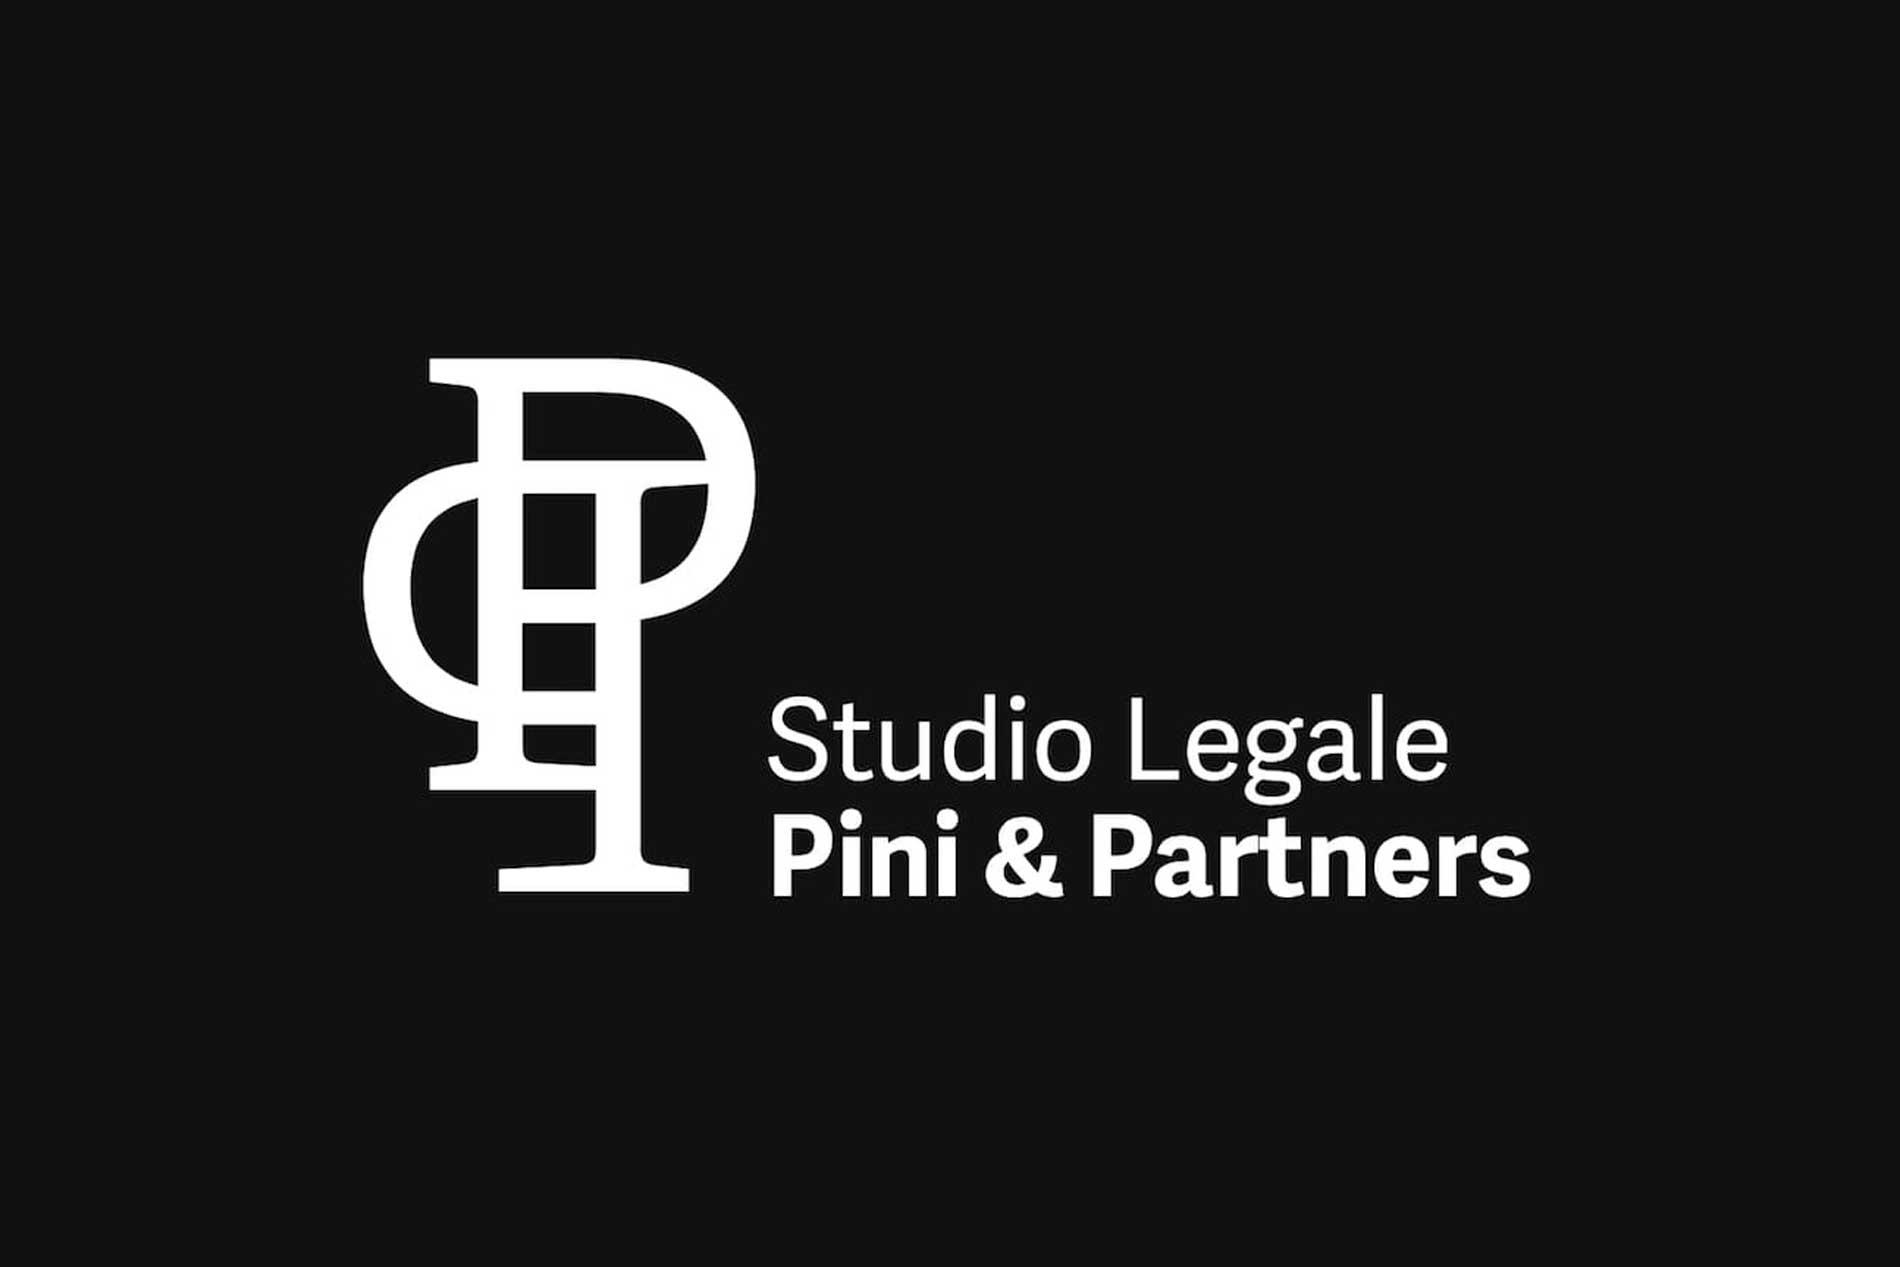 Studio Legale Pini&Partners